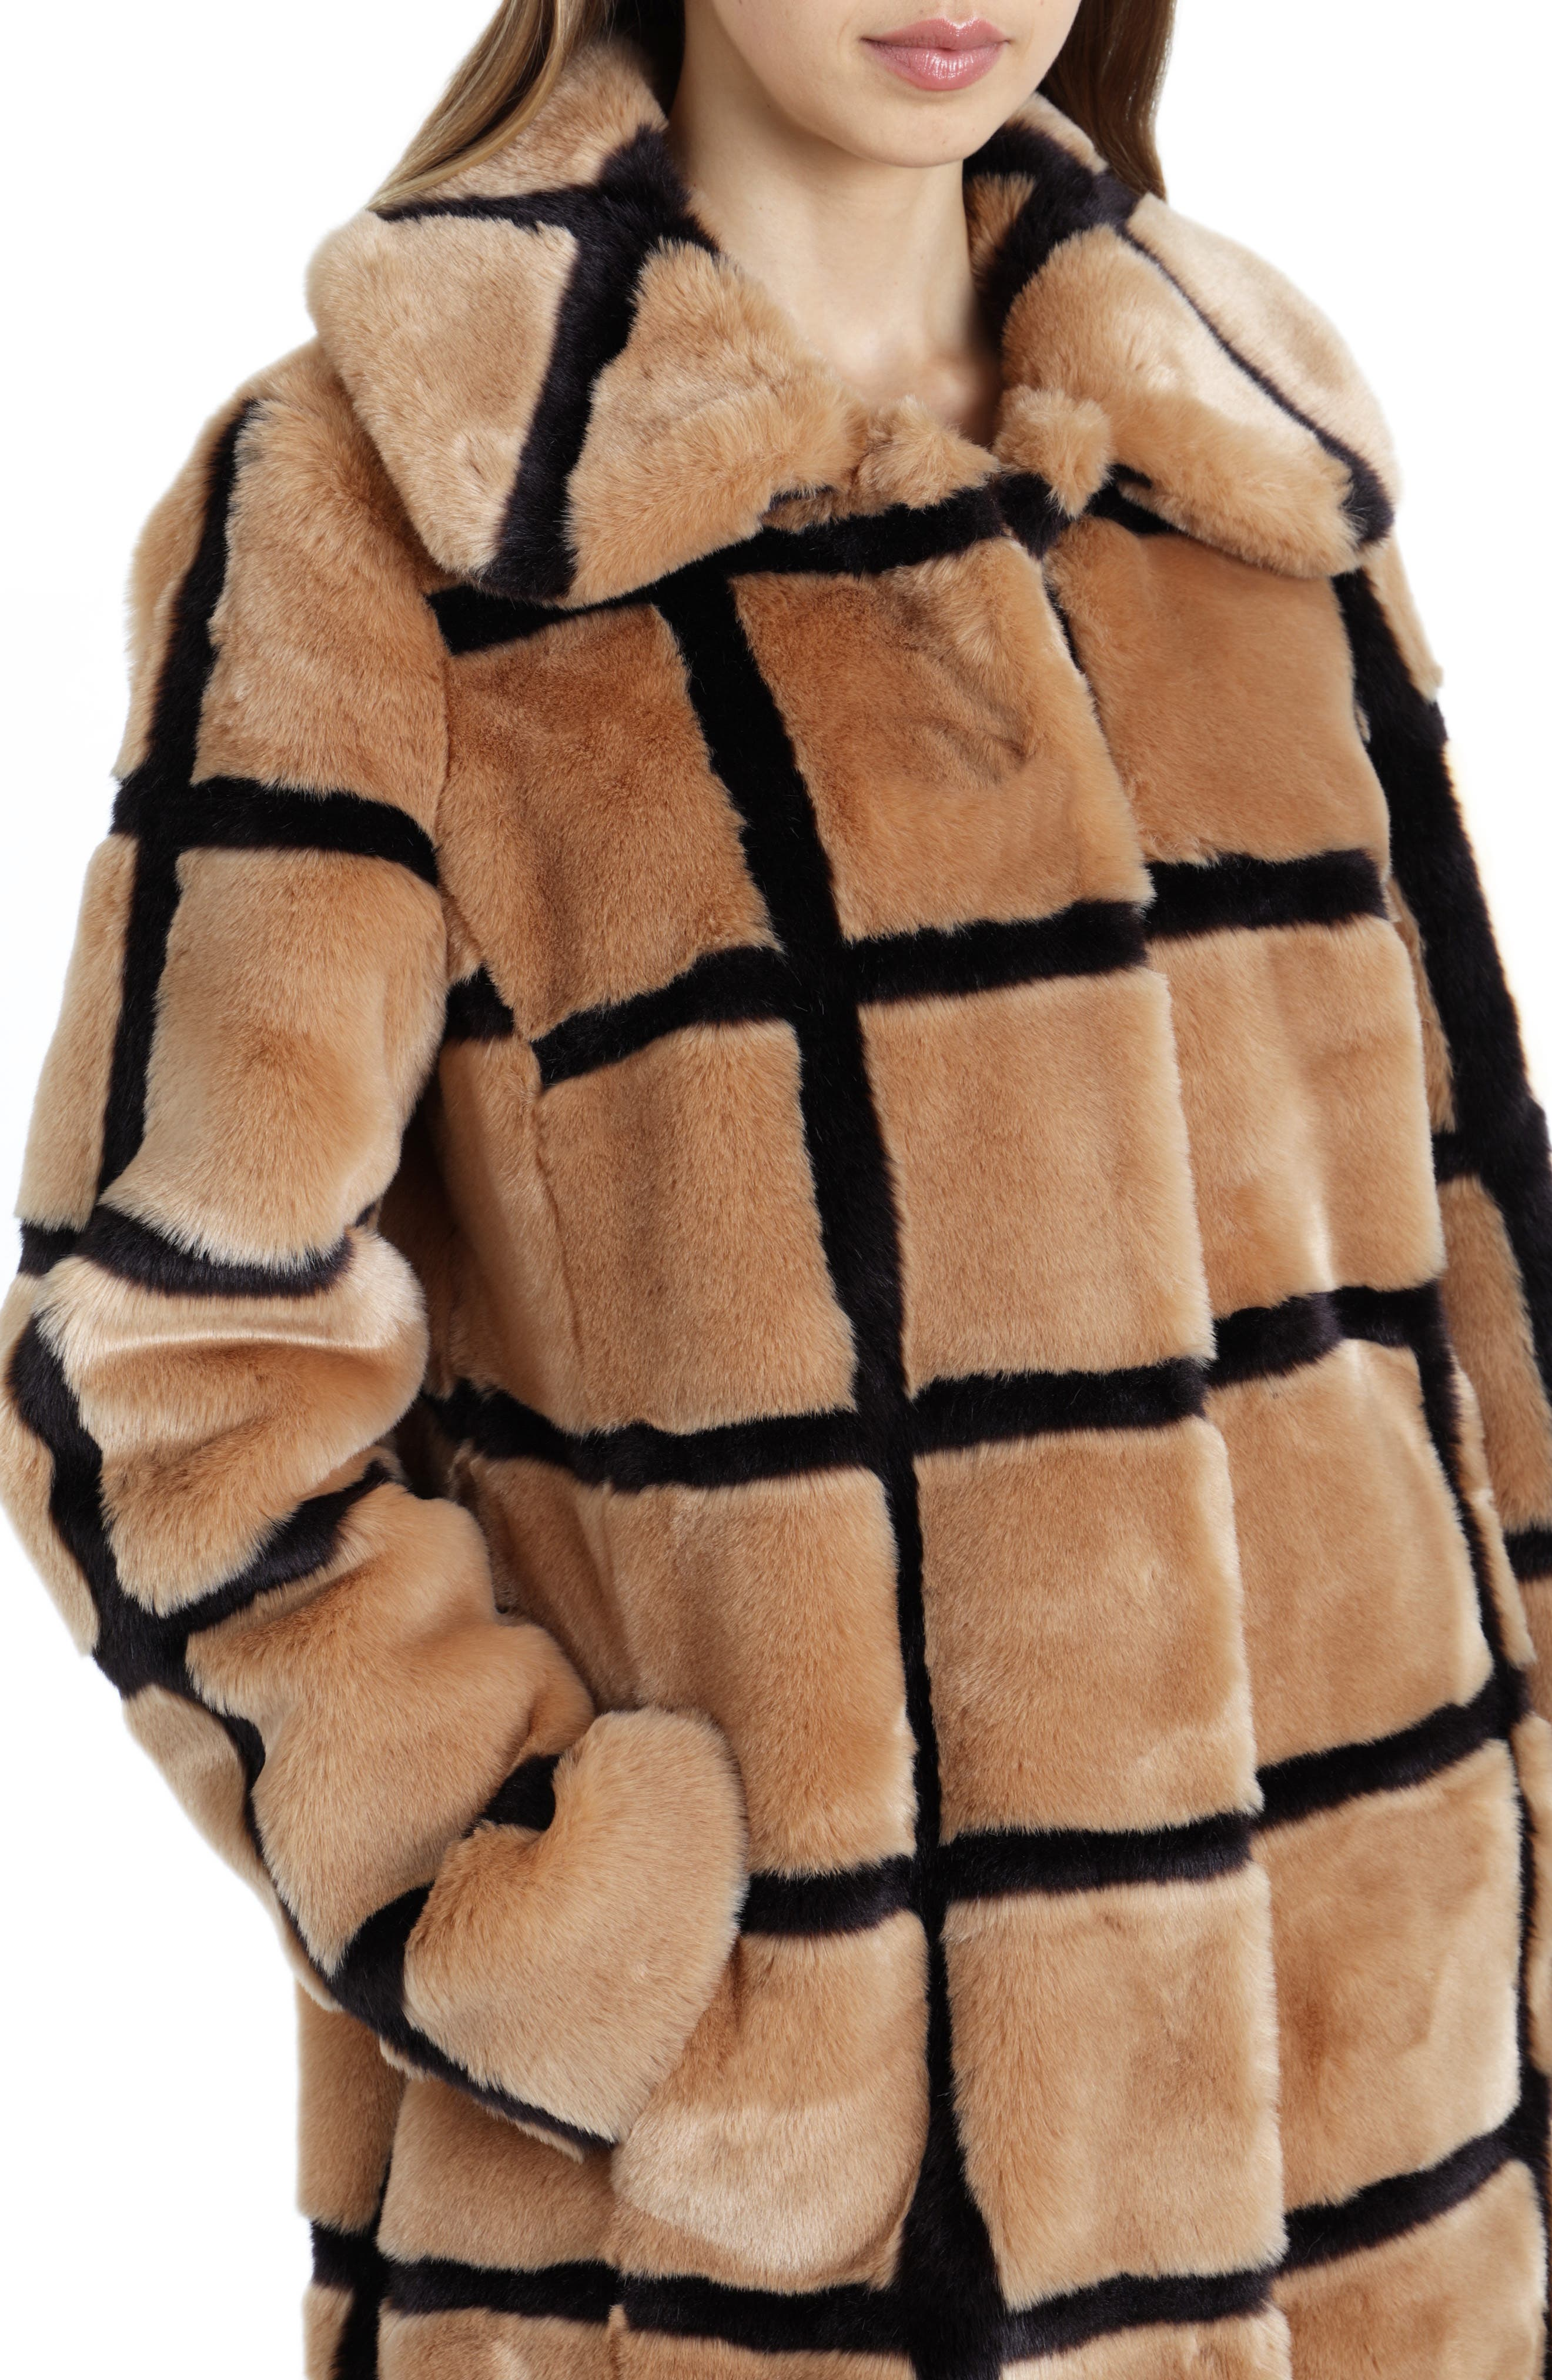 Windowpane Faux Fur Coat,                             Alternate thumbnail 4, color,                             TAN/ ESPRESSO